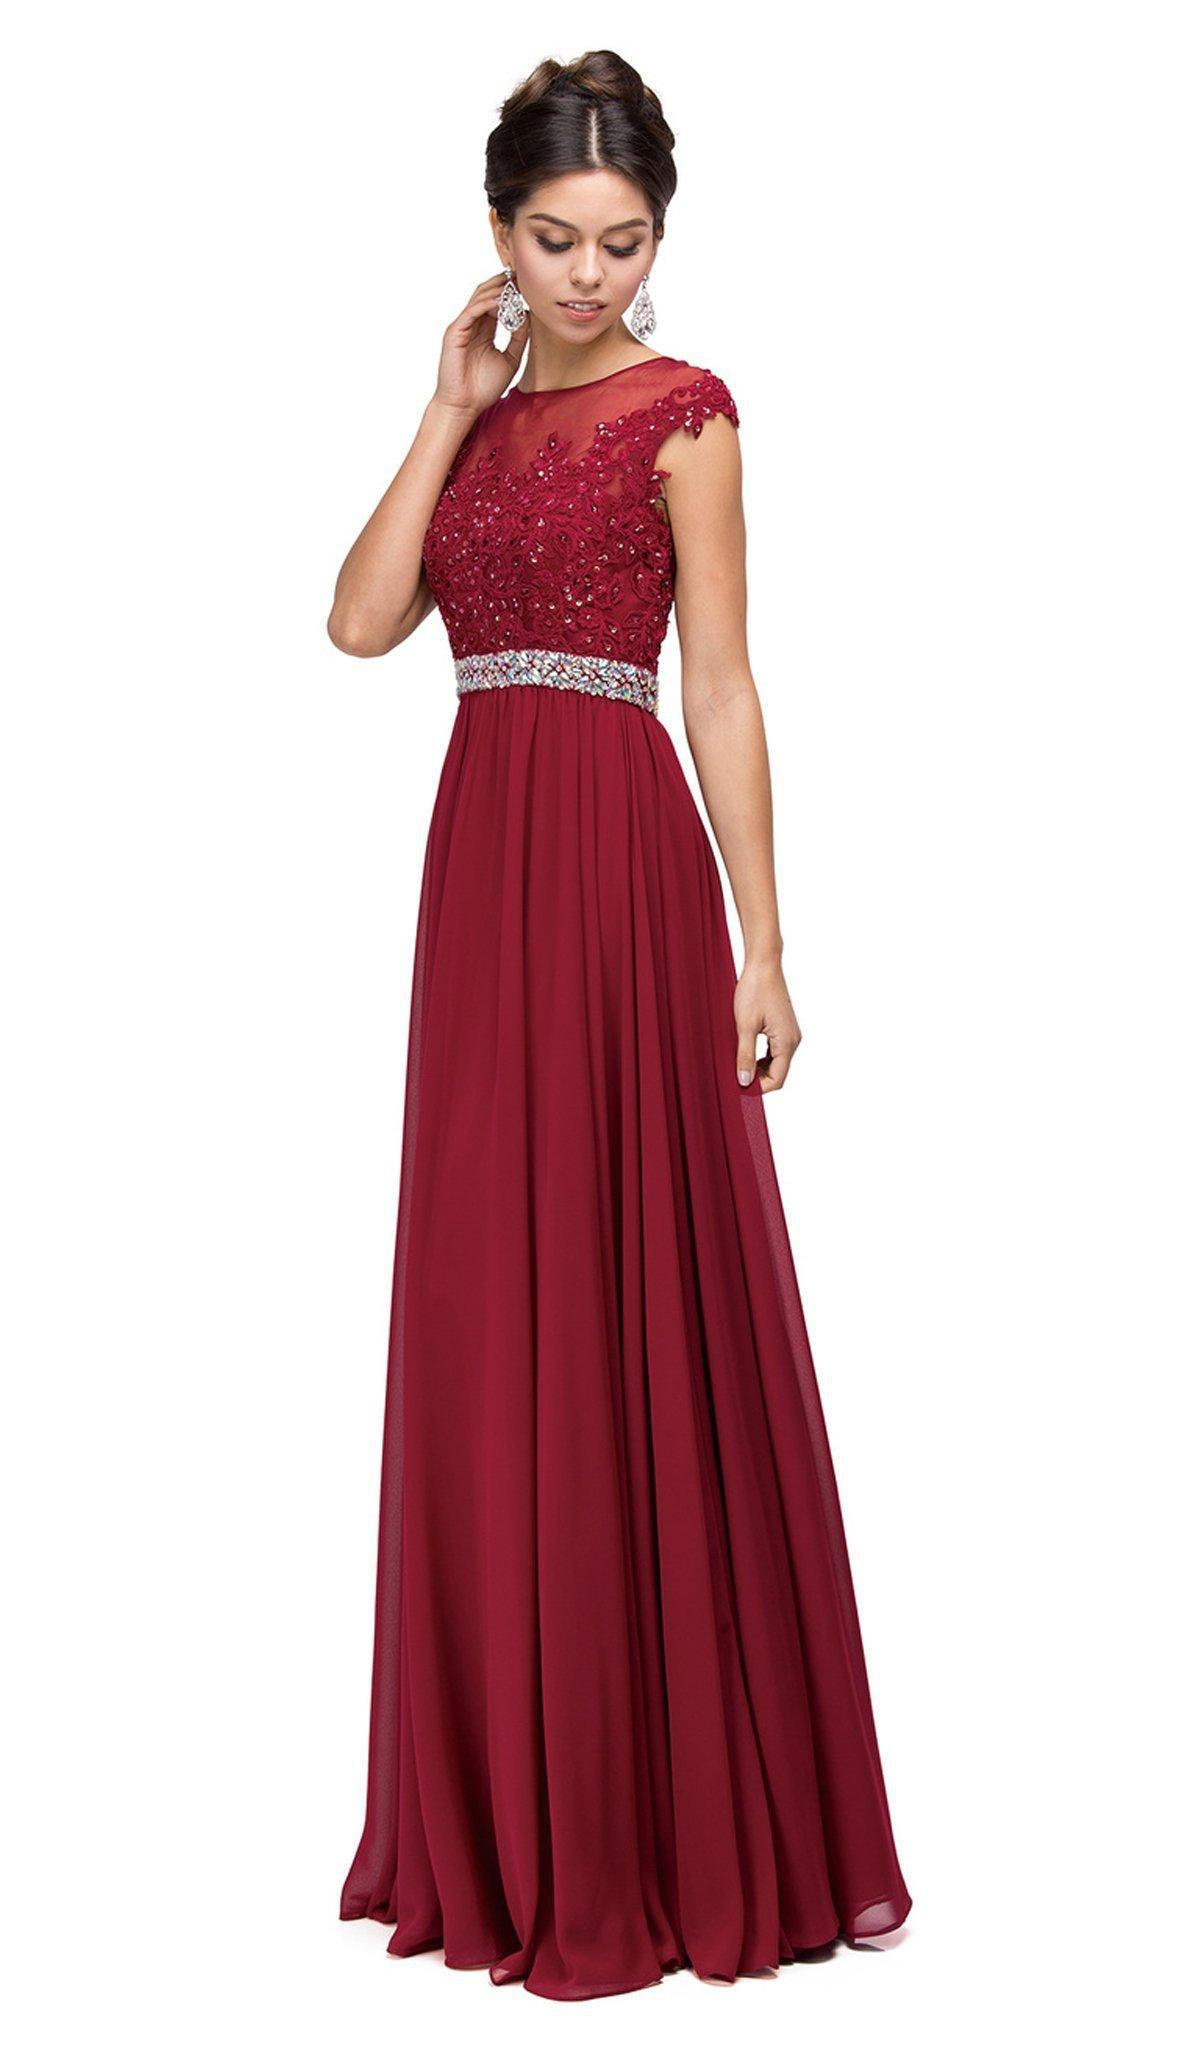 Dancing Queen - 9400 Illusion Neckline Beaded Belt A-Line Dress